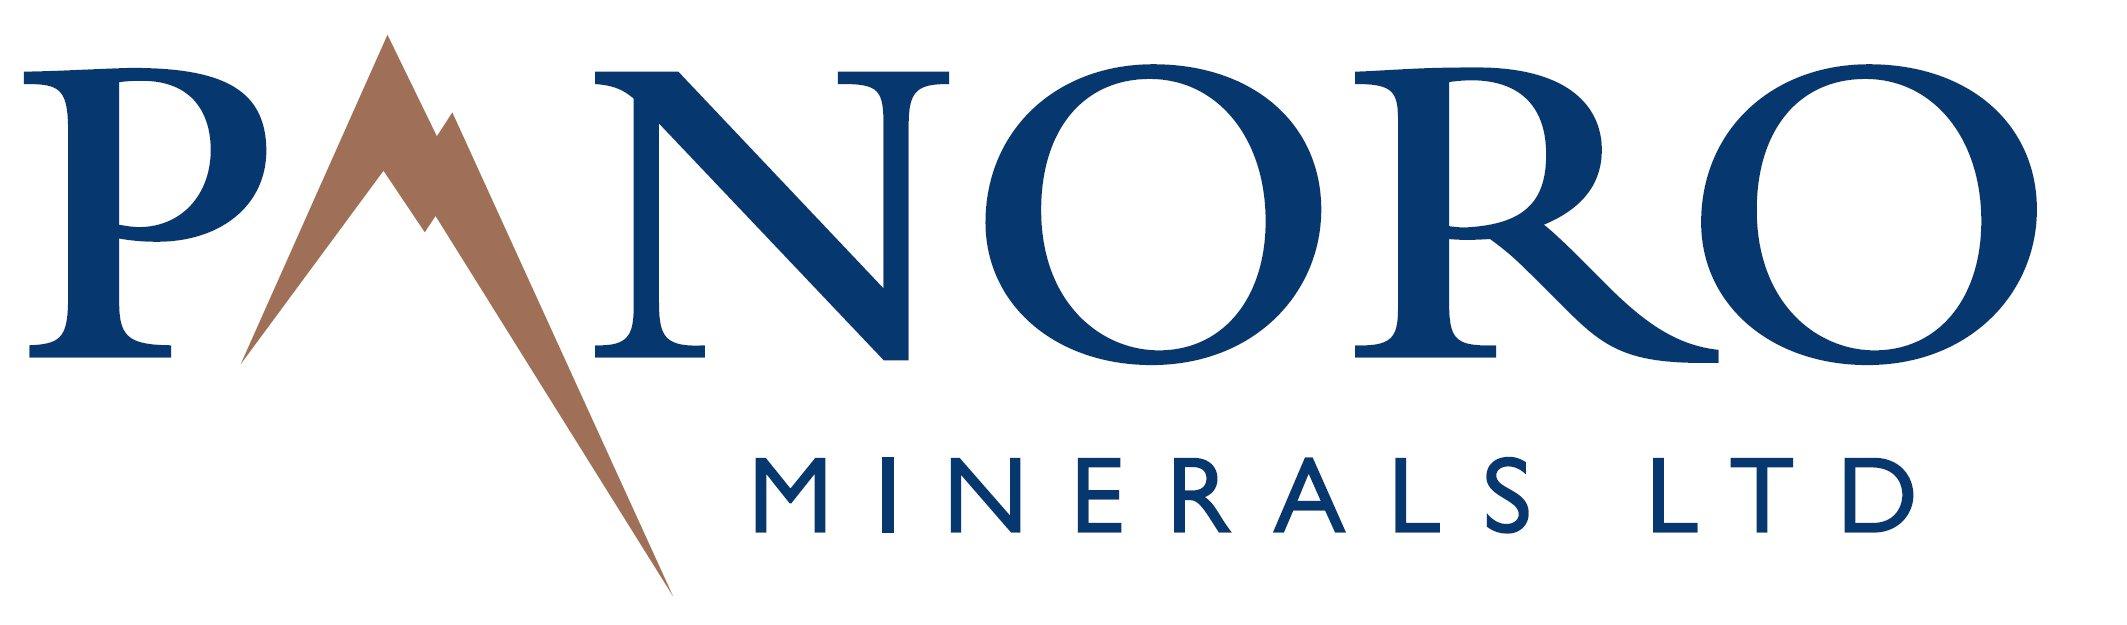 Panoro Minerals Announces Exploration Plans for Humamantata Copper Project, Peru